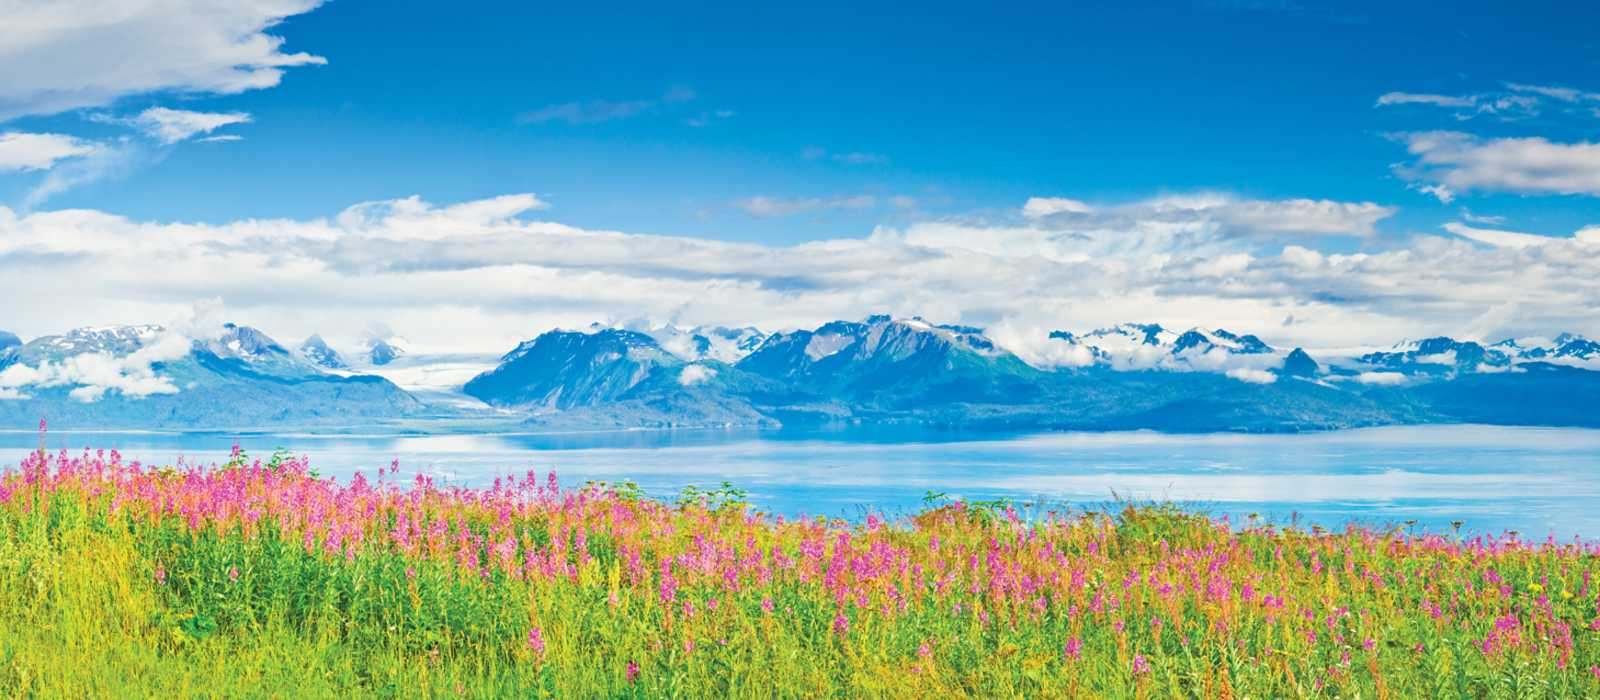 Alaska, summer scenic, Kenai Peninsula, fireweed, Kachemak Bay, and Grewingk Glacier from Homer